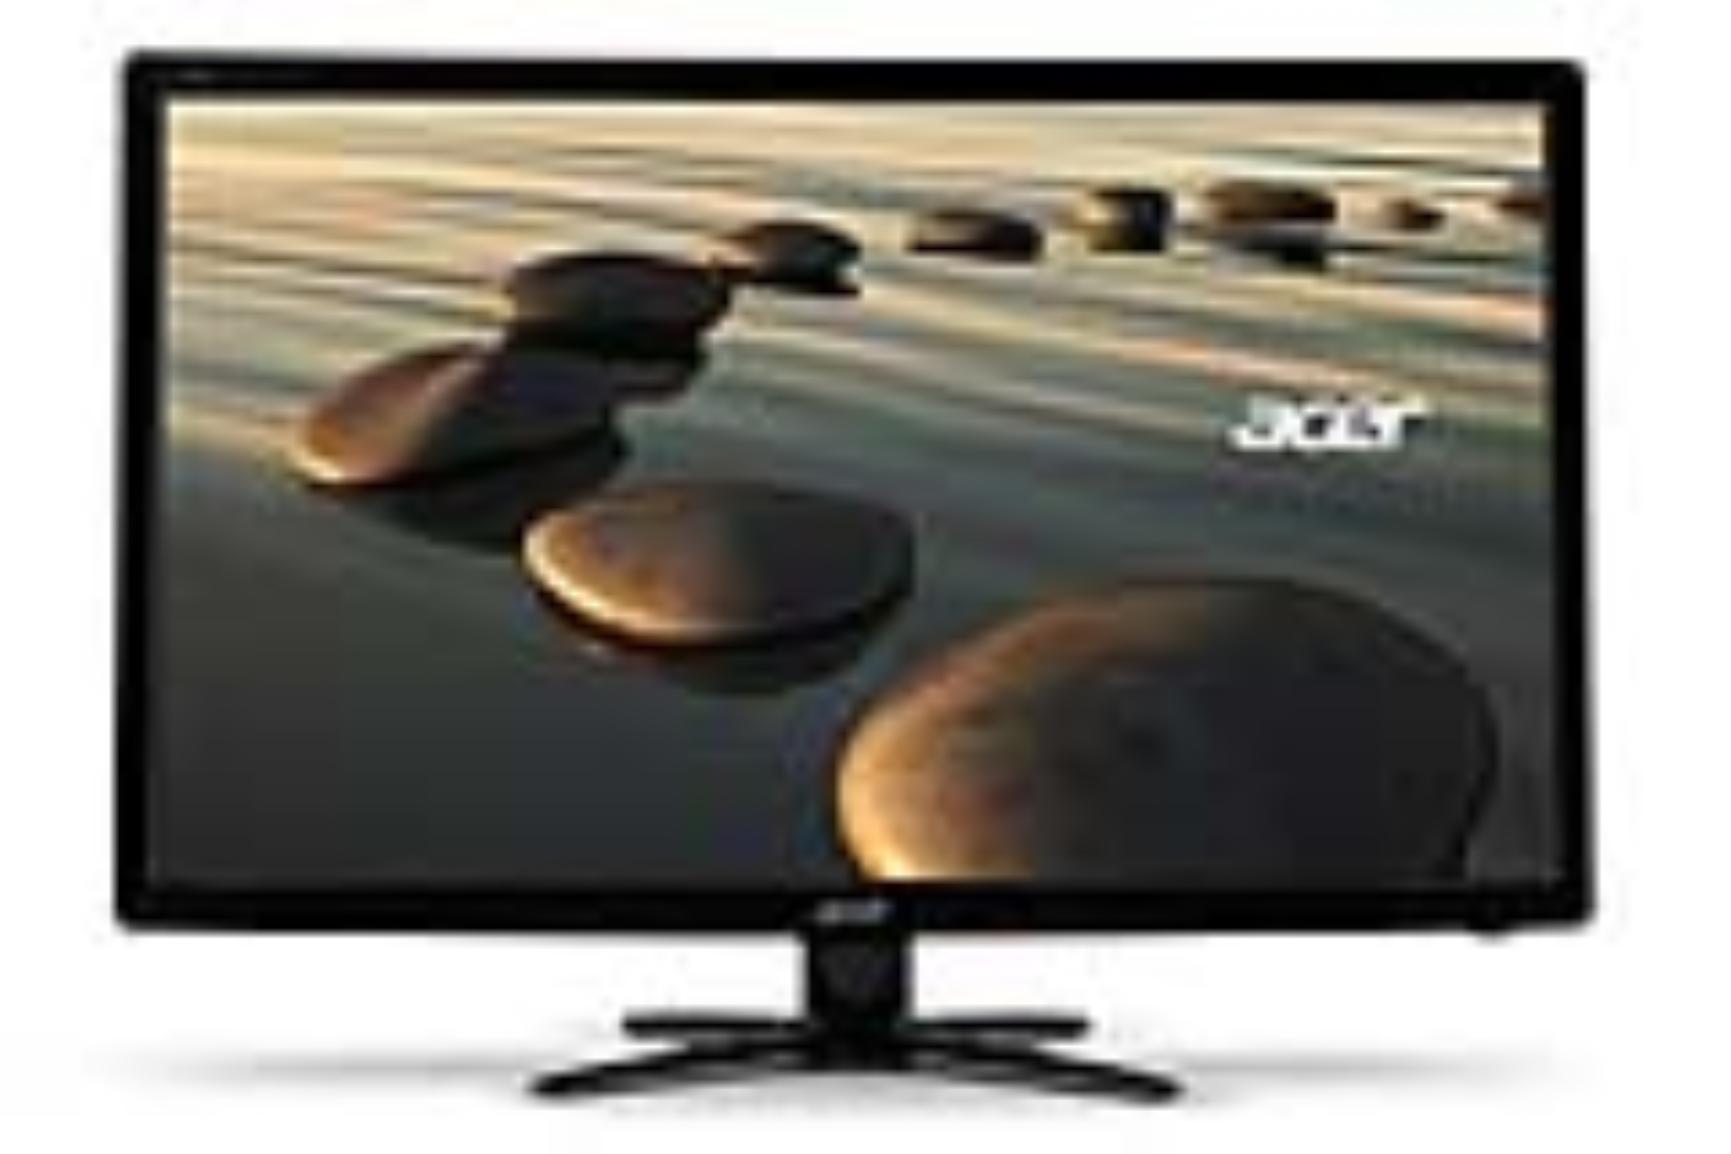 "Acer LCD GN246HLBbid, 61cm (24"") LED 144Hz, 1920 x 1080, 100M:1, 1ms, DVI, HDMI, Black, 3D monitor with NVIDIA"